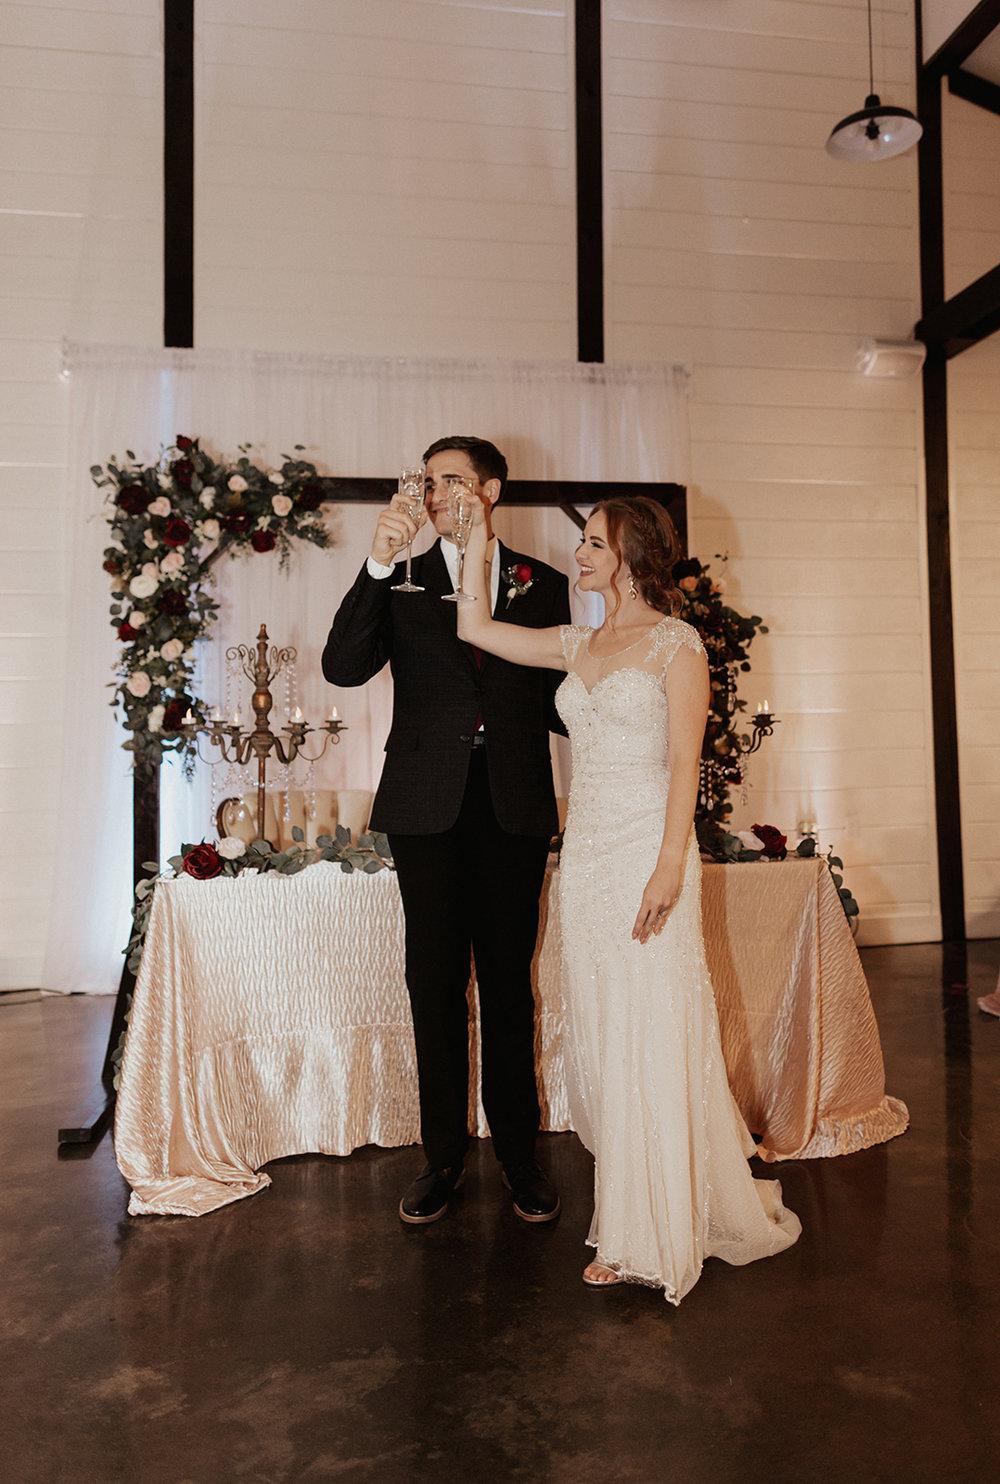 Best Wedding Venue in Tulsa Bixby Dream Point Ranch 60.jpg